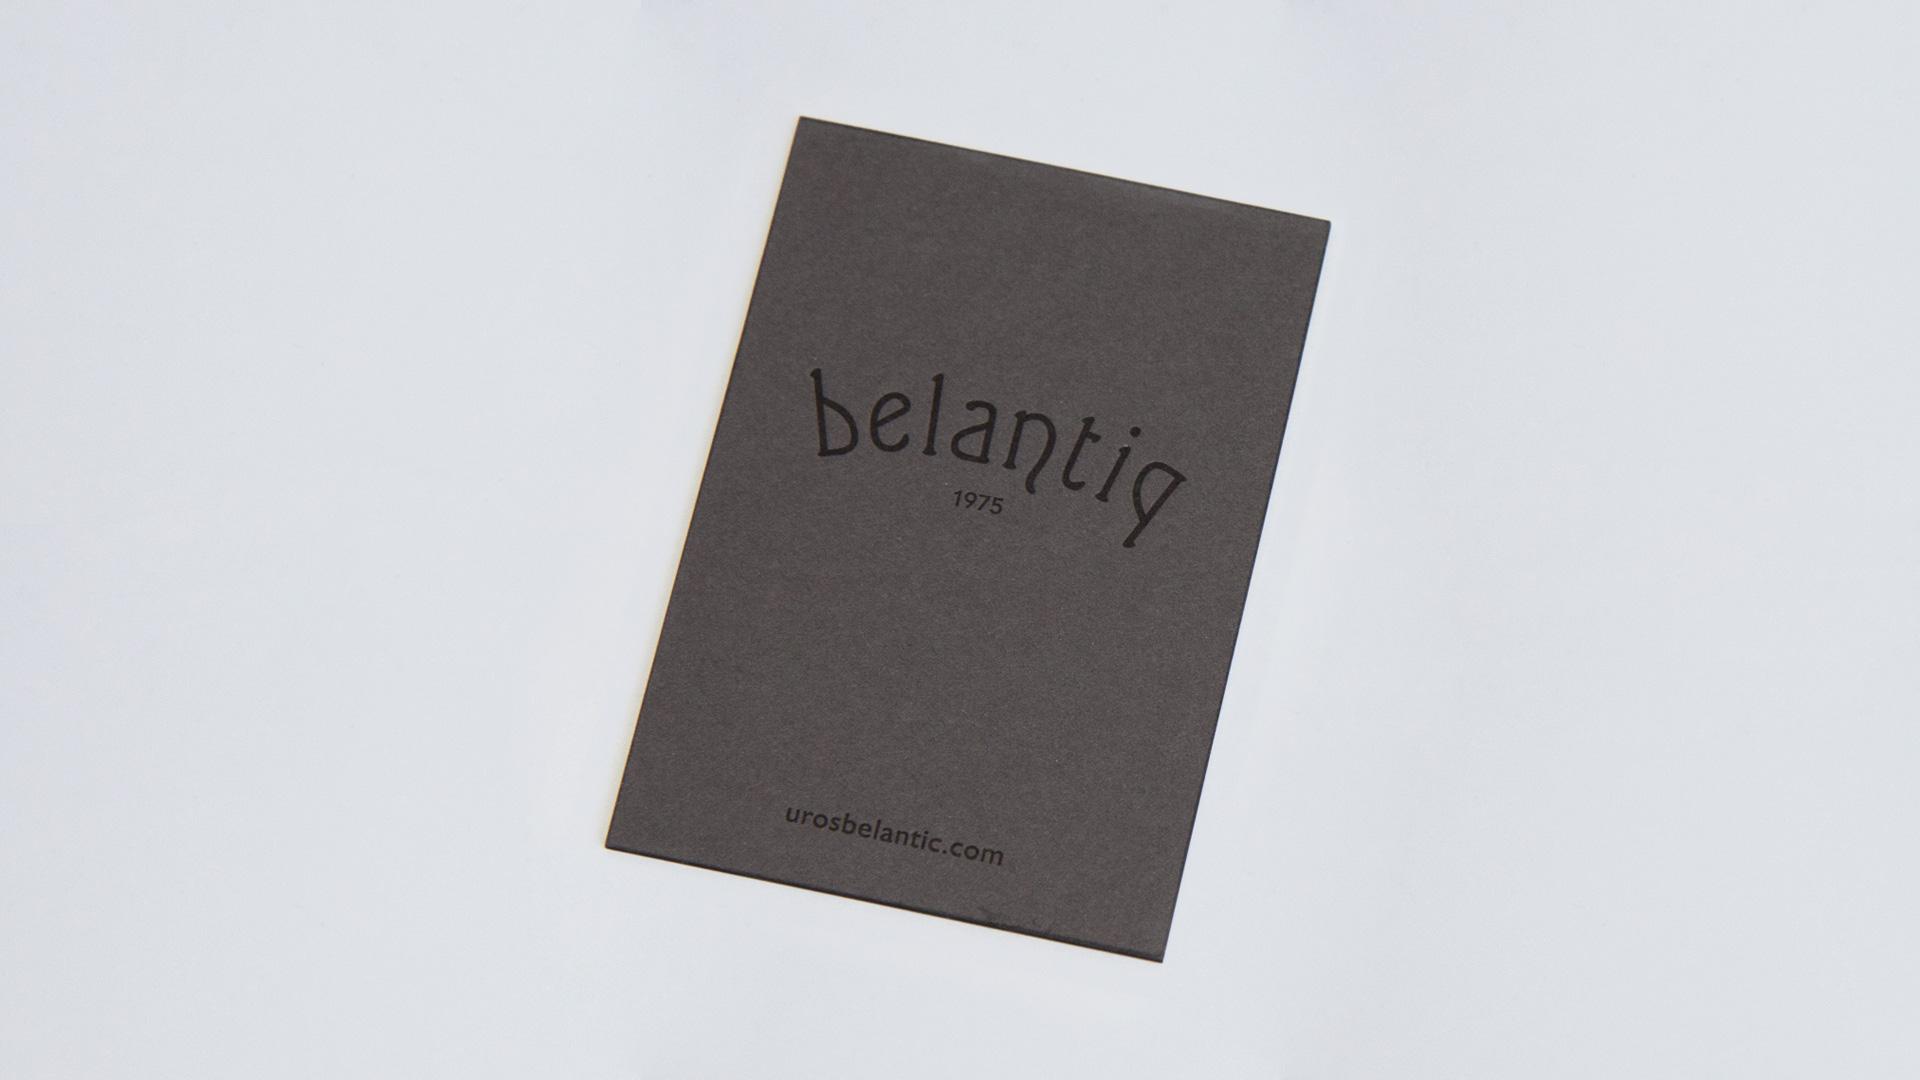 belantiq-model-2